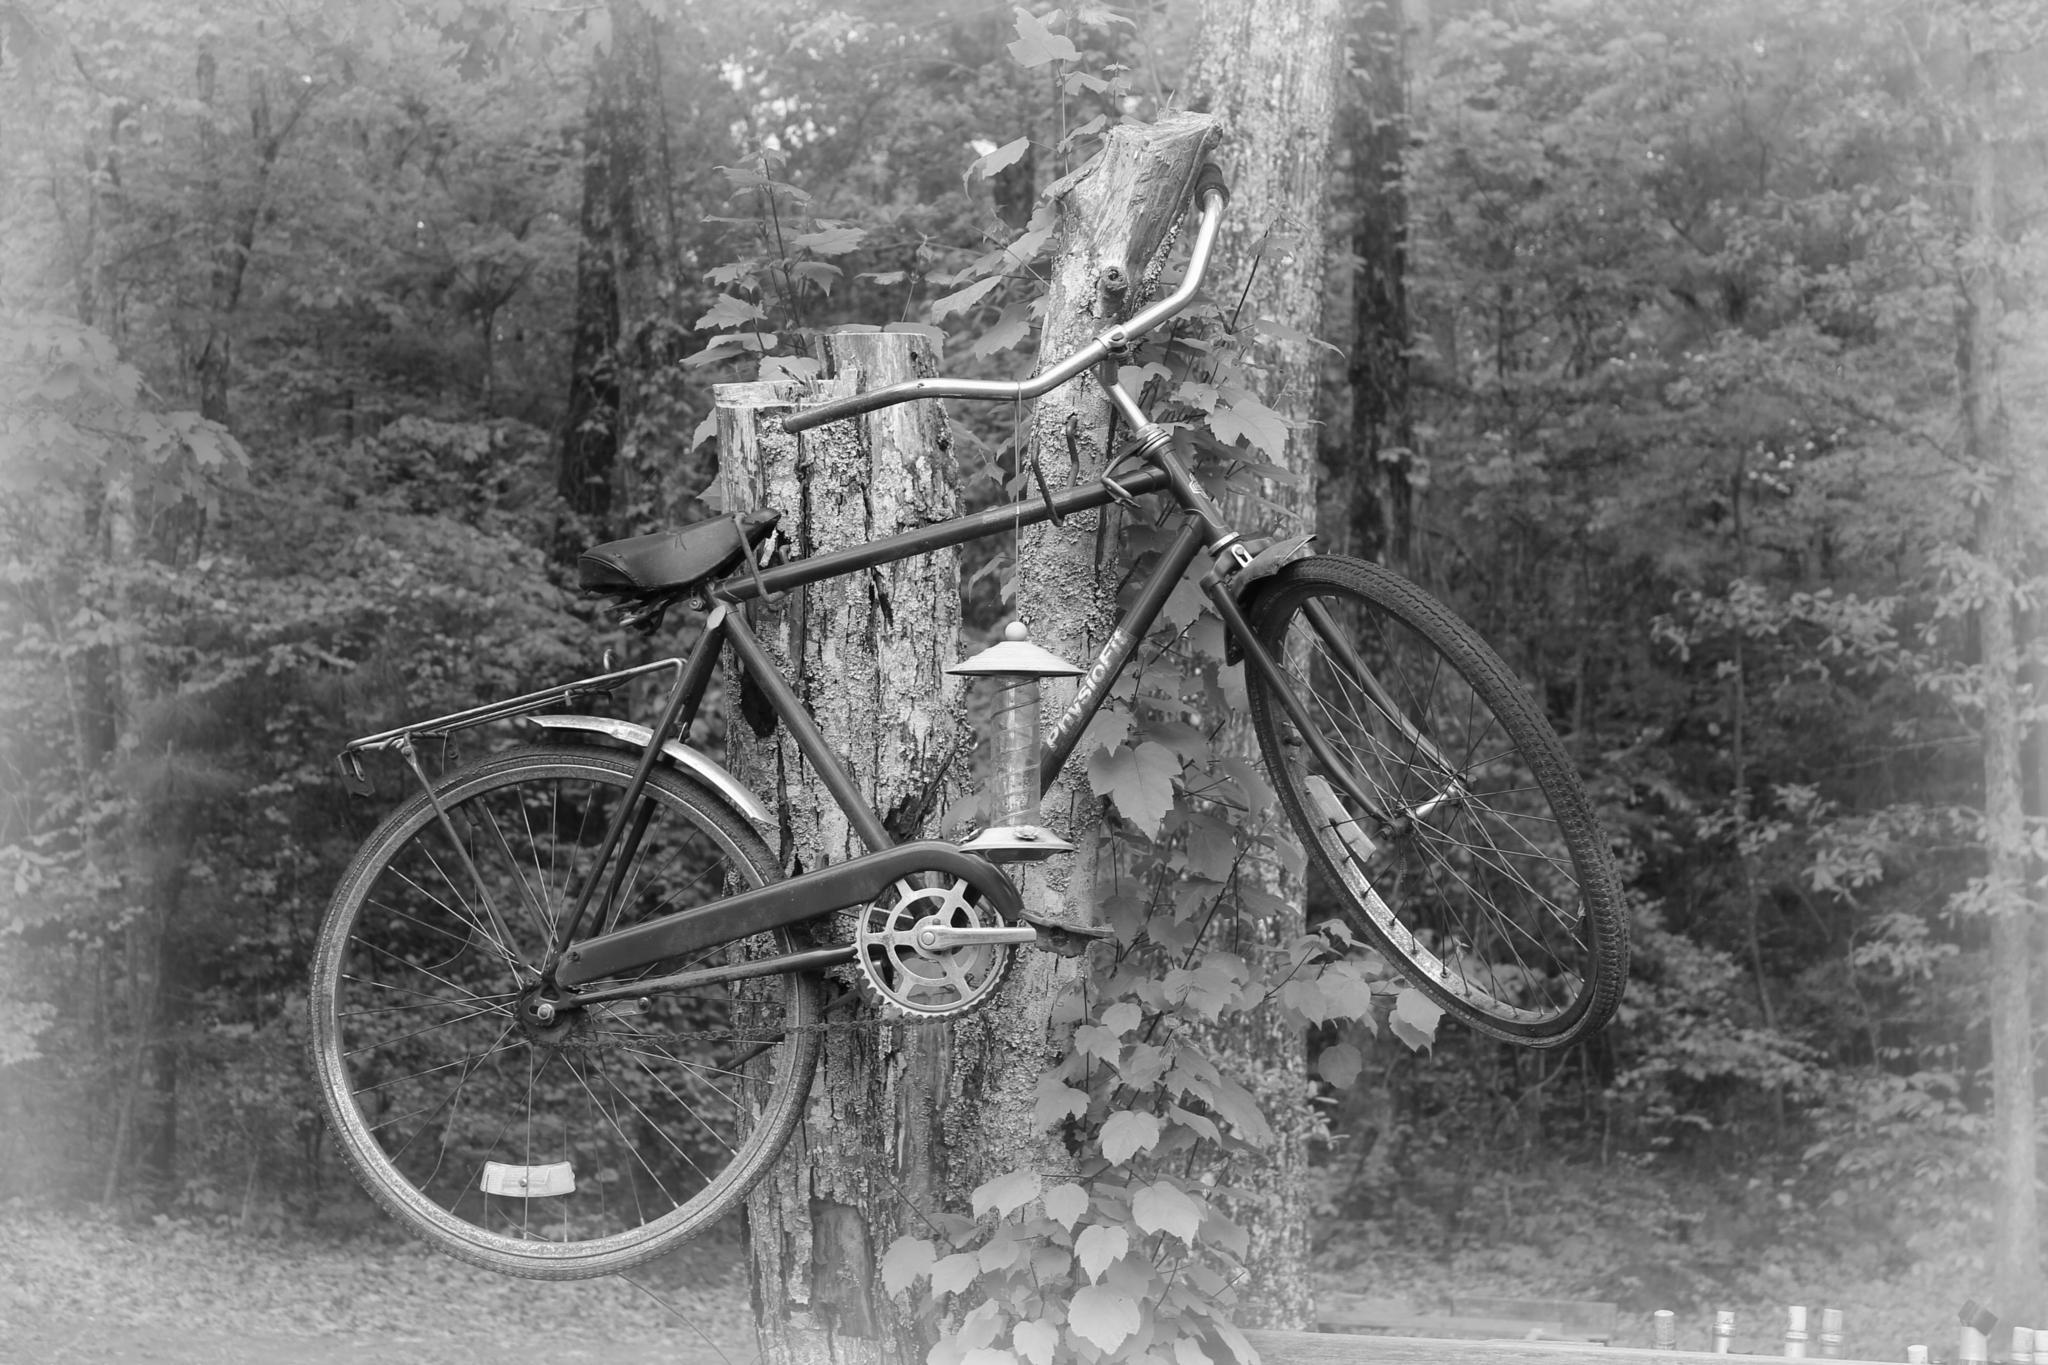 Last Ride by craig.turner.756